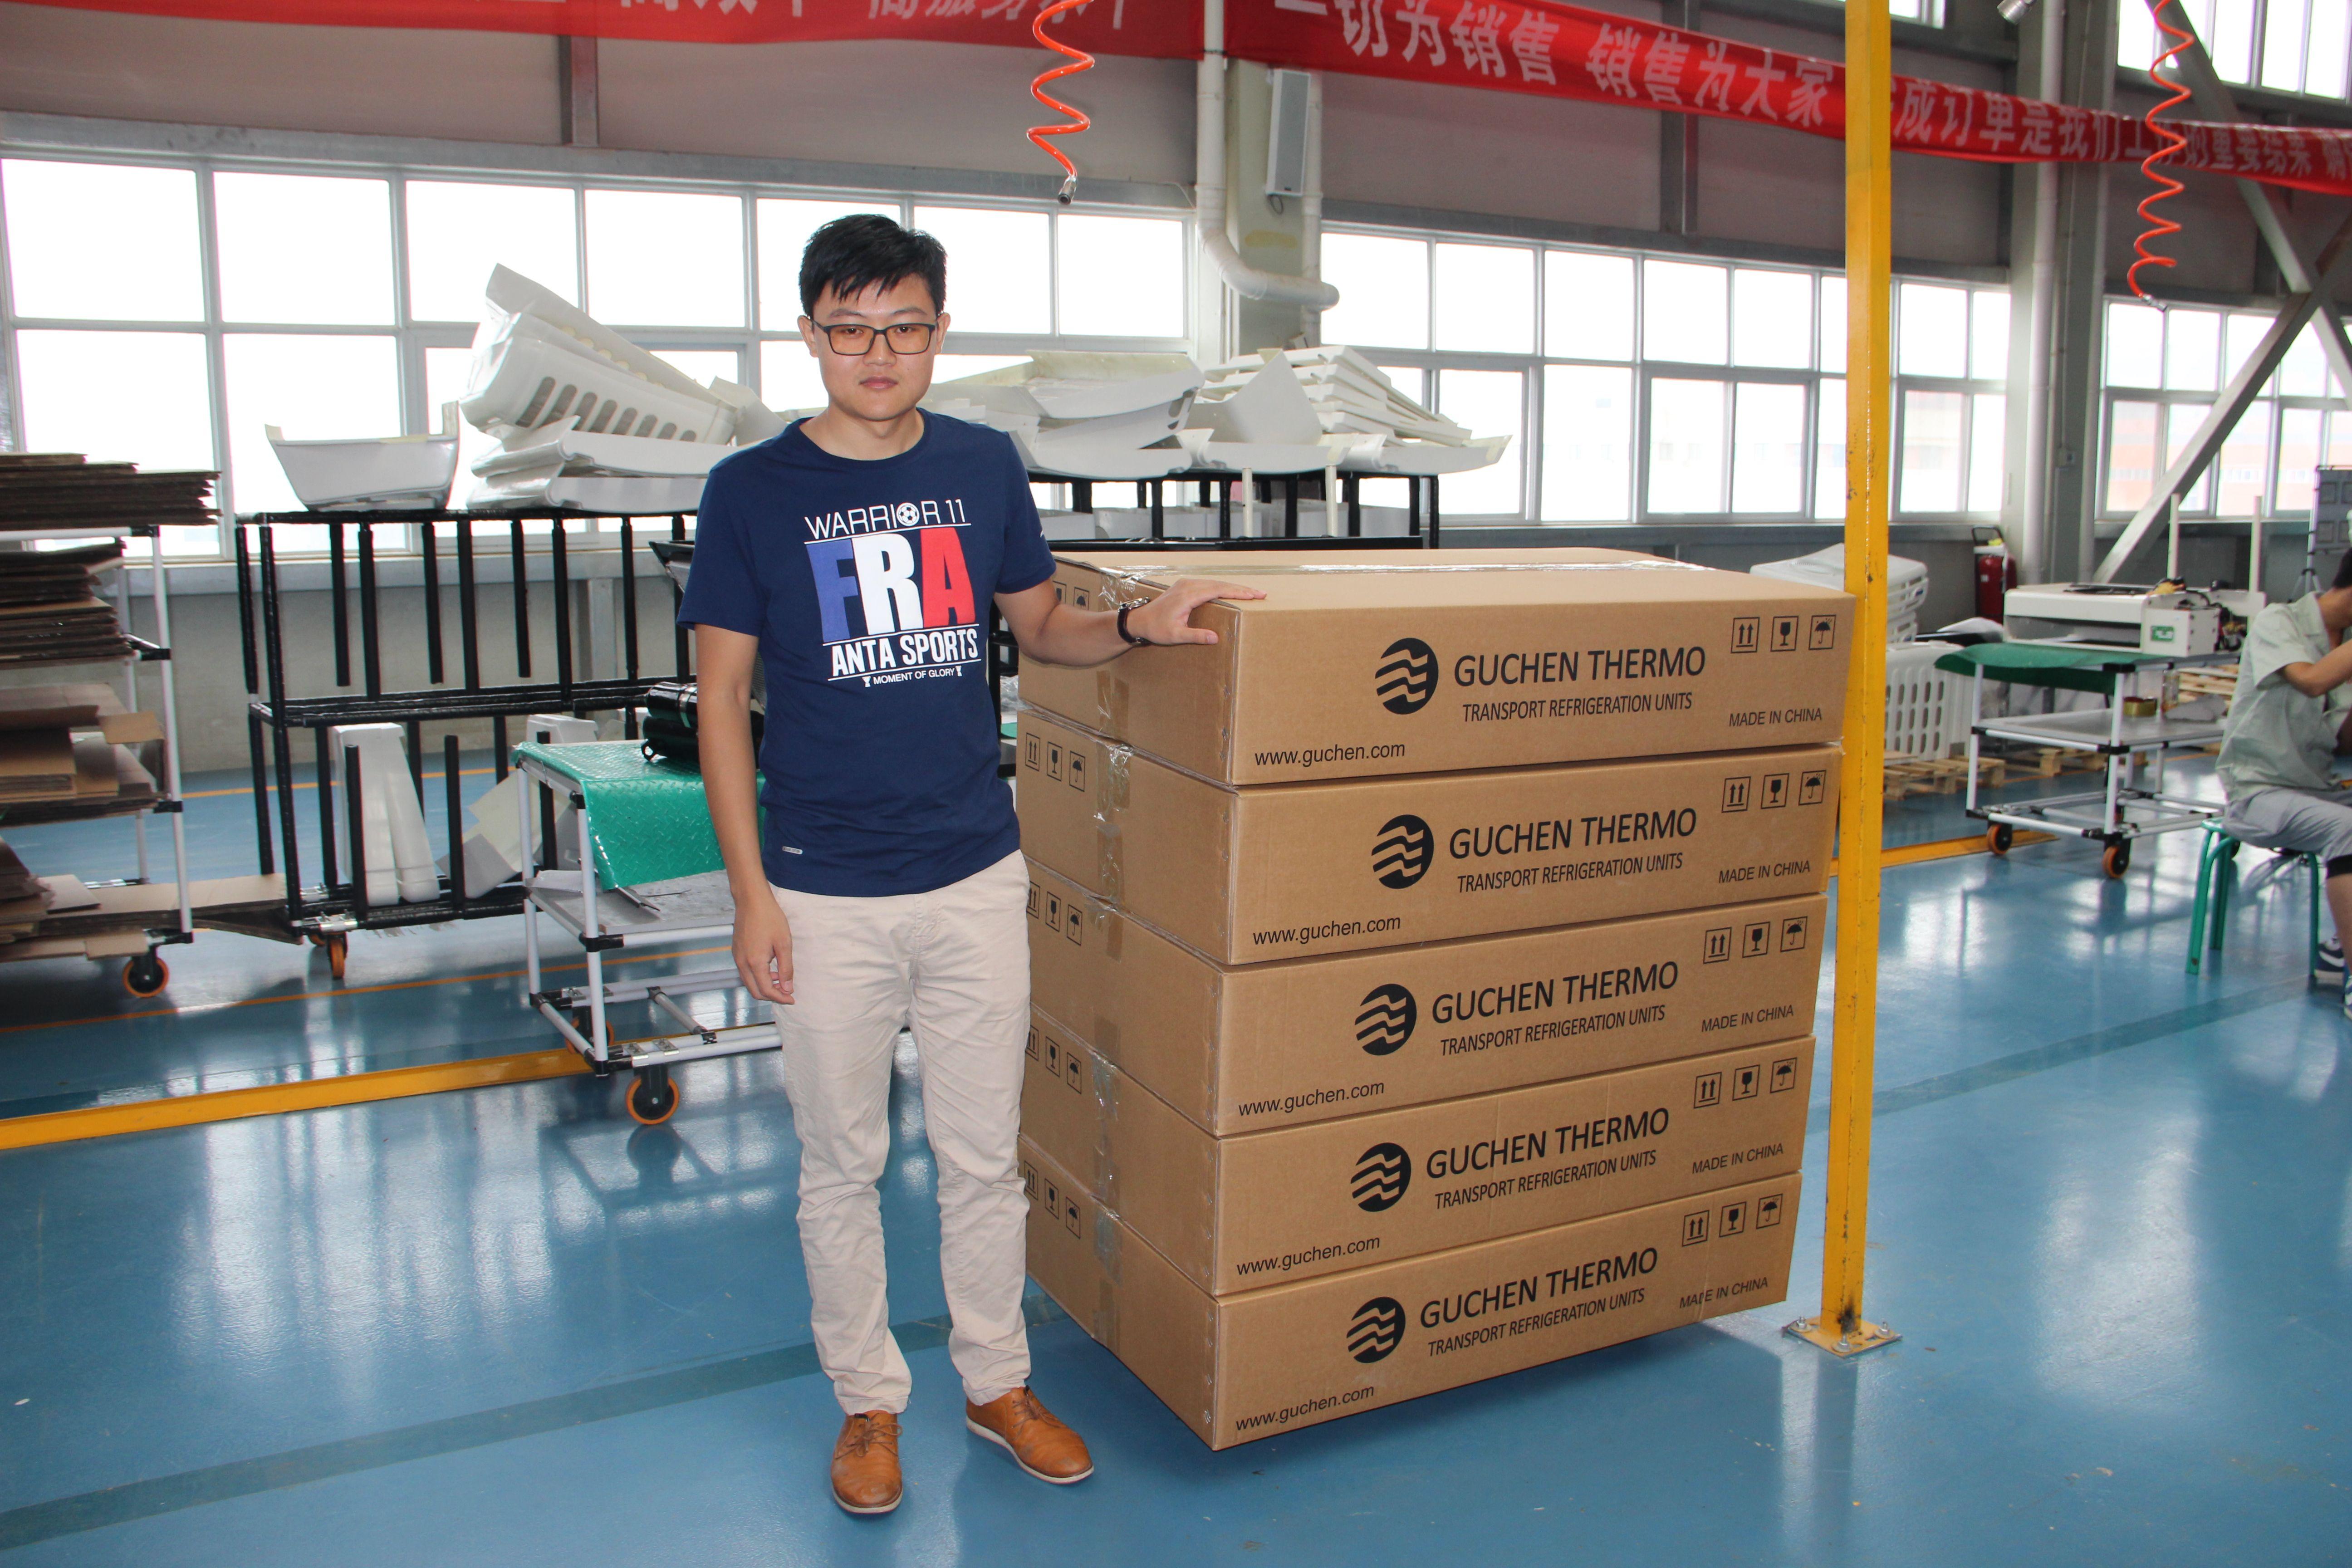 guchen refrigeration unit shipping The unit, Pickup